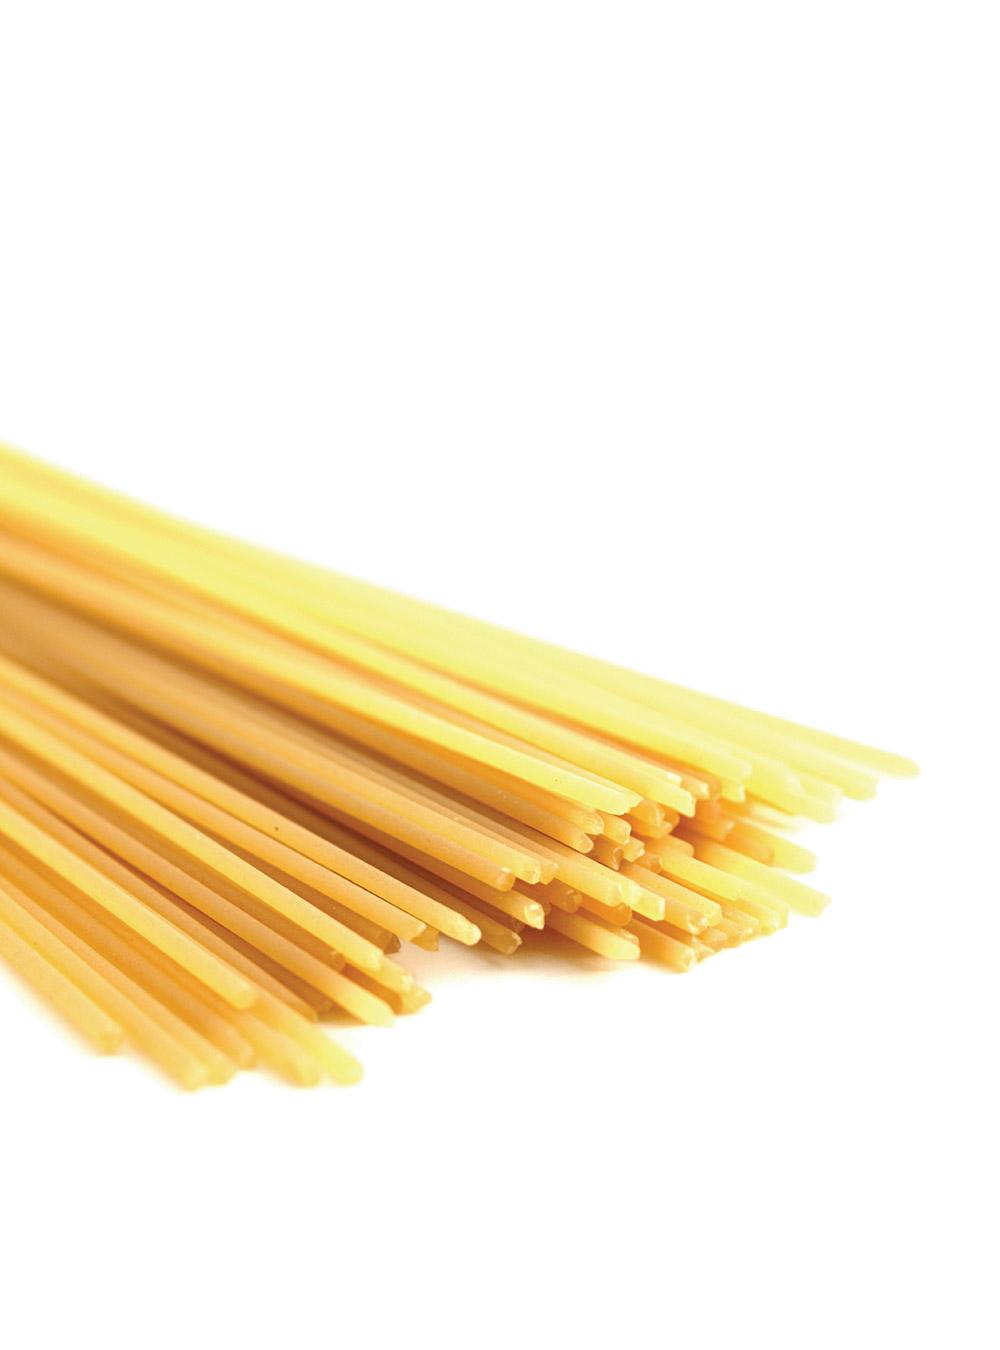 Pâtes au citron, au poivre et au parmigiano reggiano | ricardo